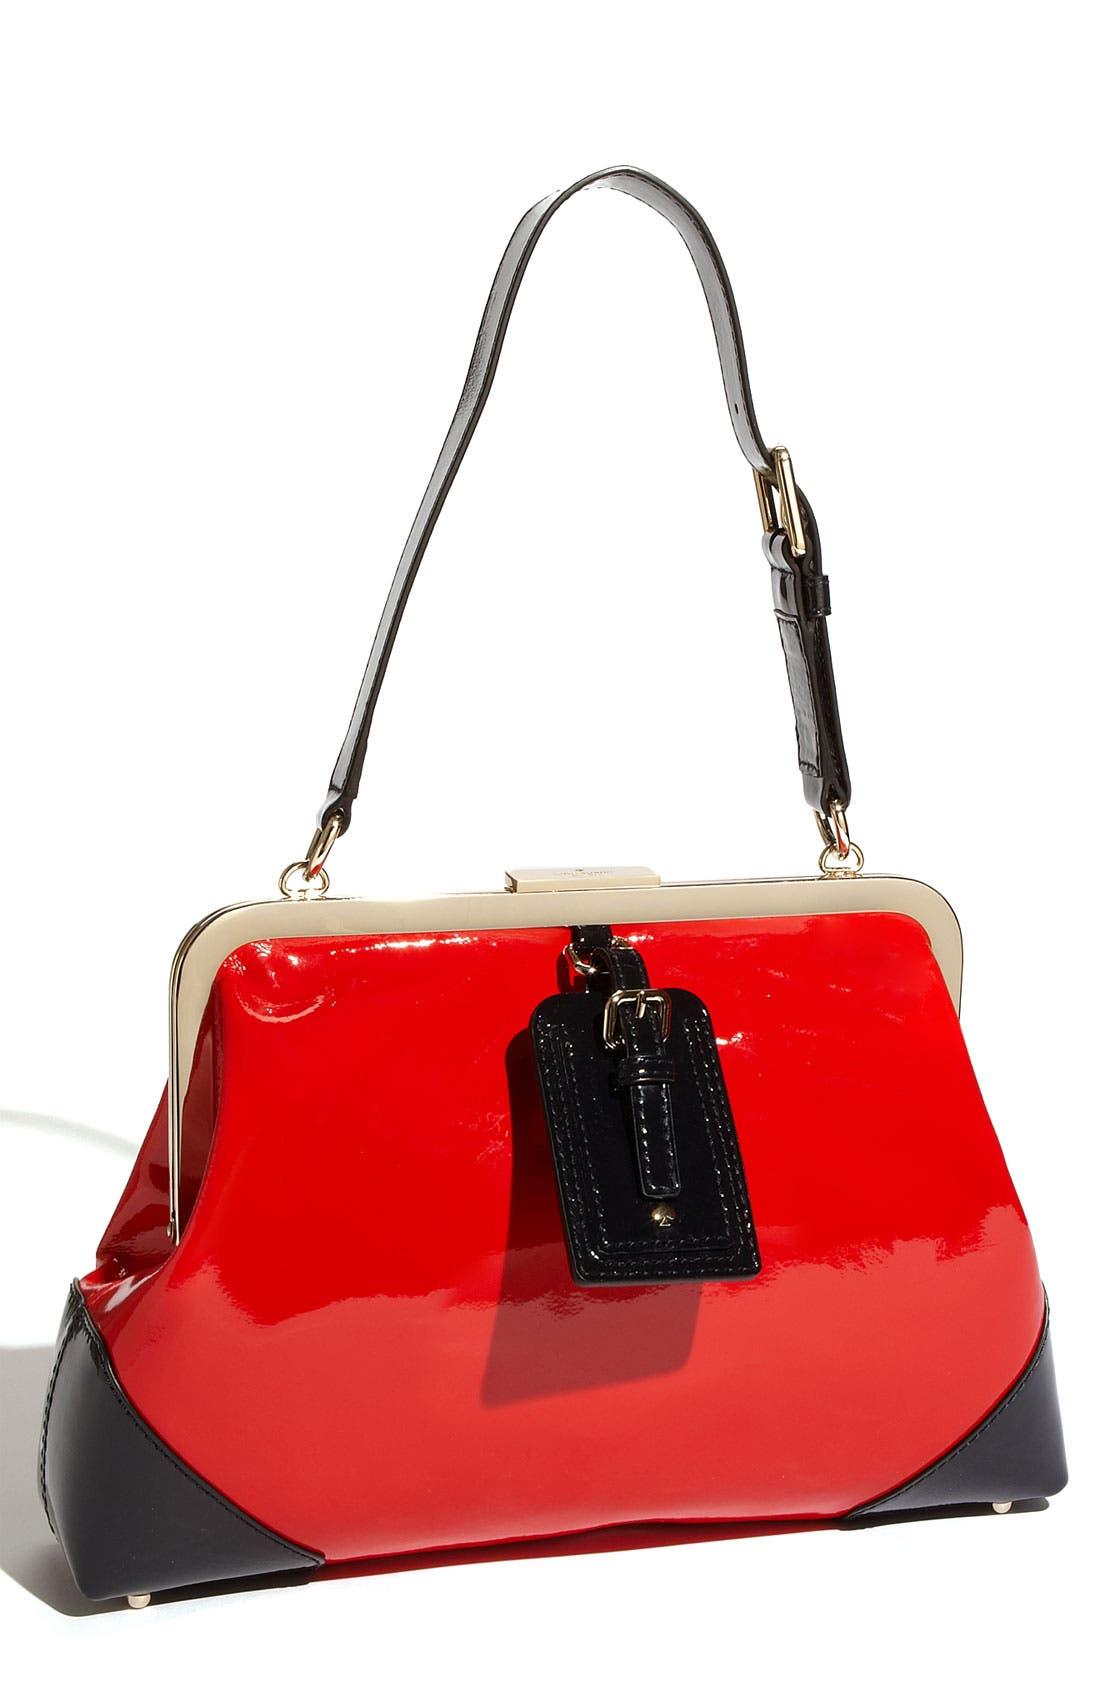 Main Image - kate spade new york 'barclay street - parker' patent leather shoulder bag